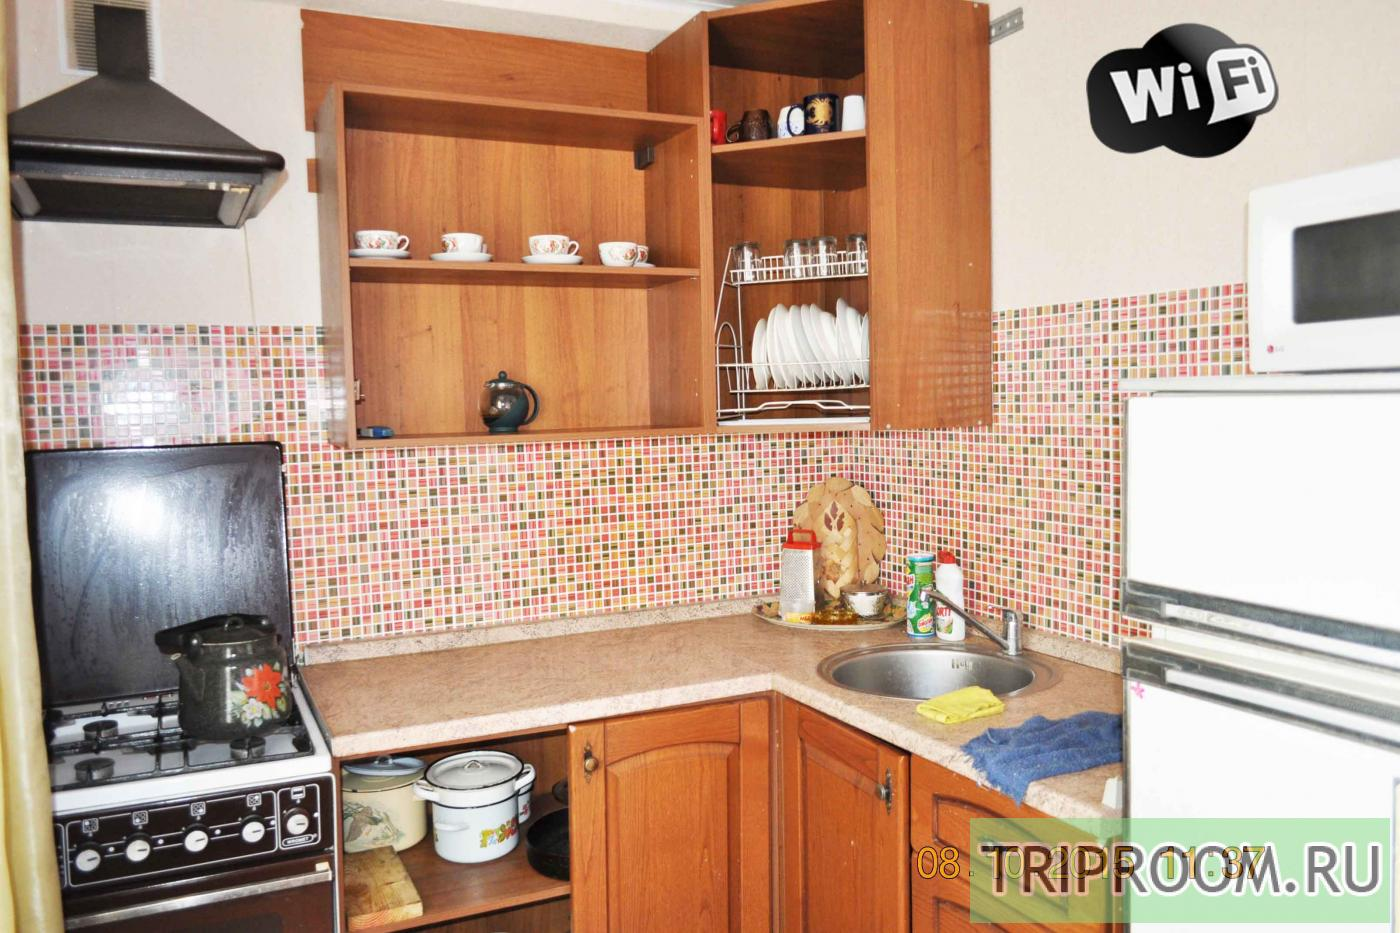 2-комнатная квартира посуточно (вариант № 11708), ул. Амосова улица, фото № 23